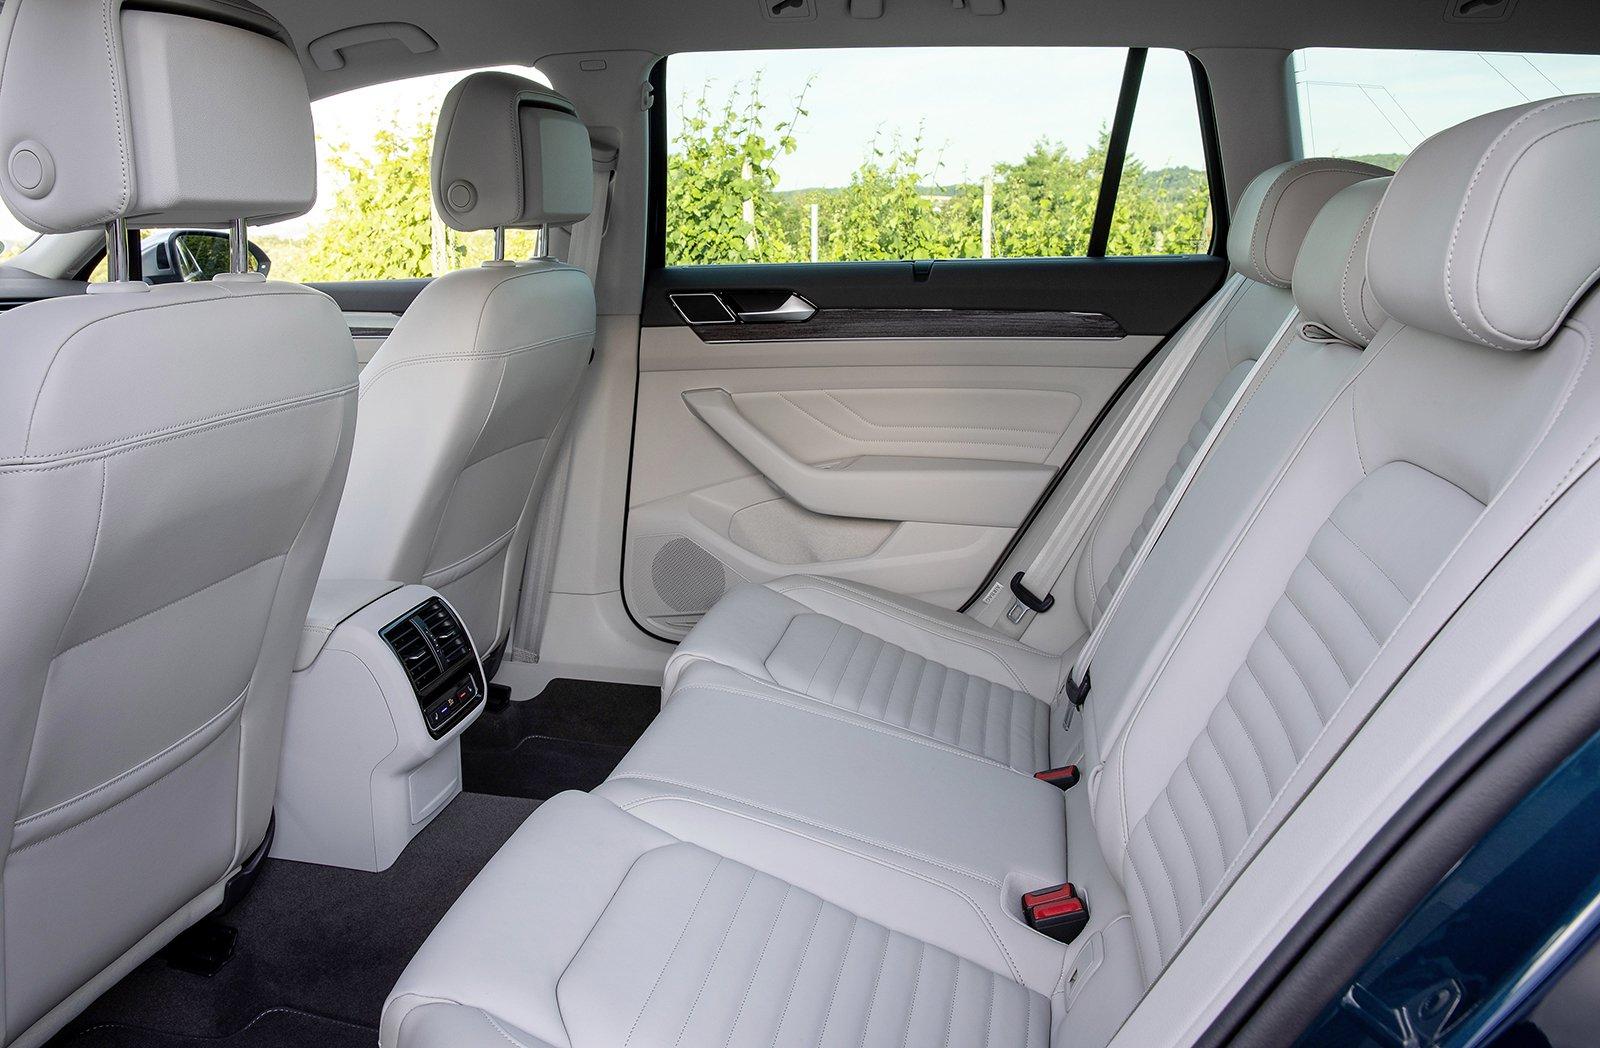 Volkswagen Passat Alltrack 2019 LHD rear seats